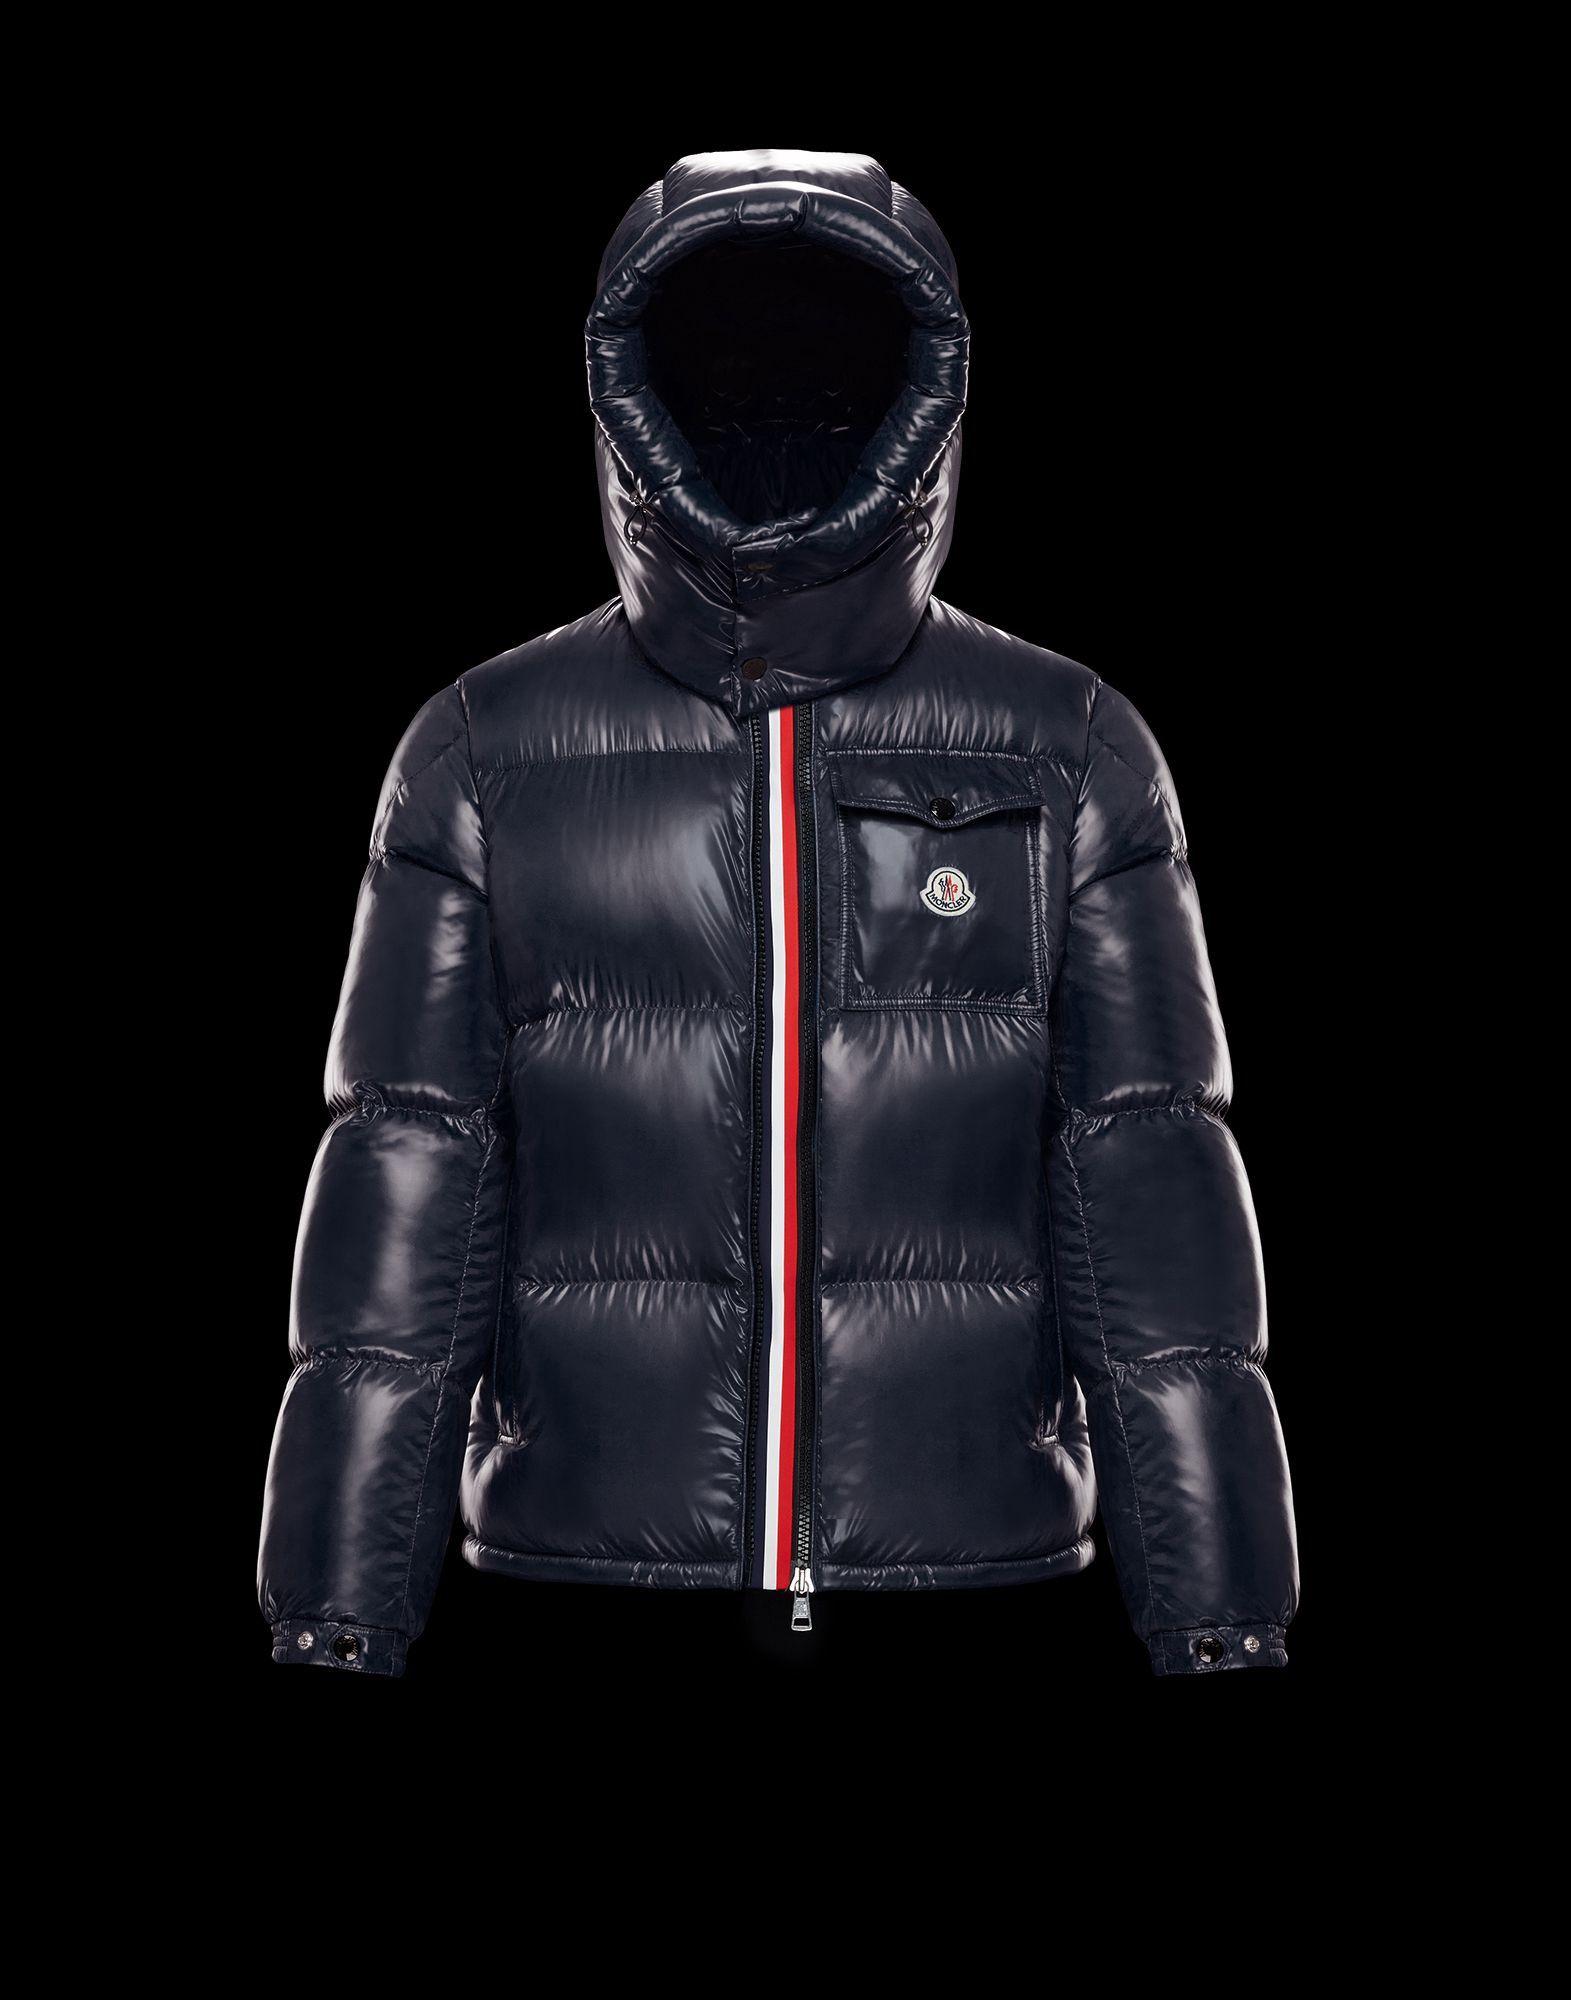 Moncler Montbeliard For Man Outerwear Official Online Store Moncler Jacket Mens Moncler Moncler Jacket [ 2000 x 1571 Pixel ]